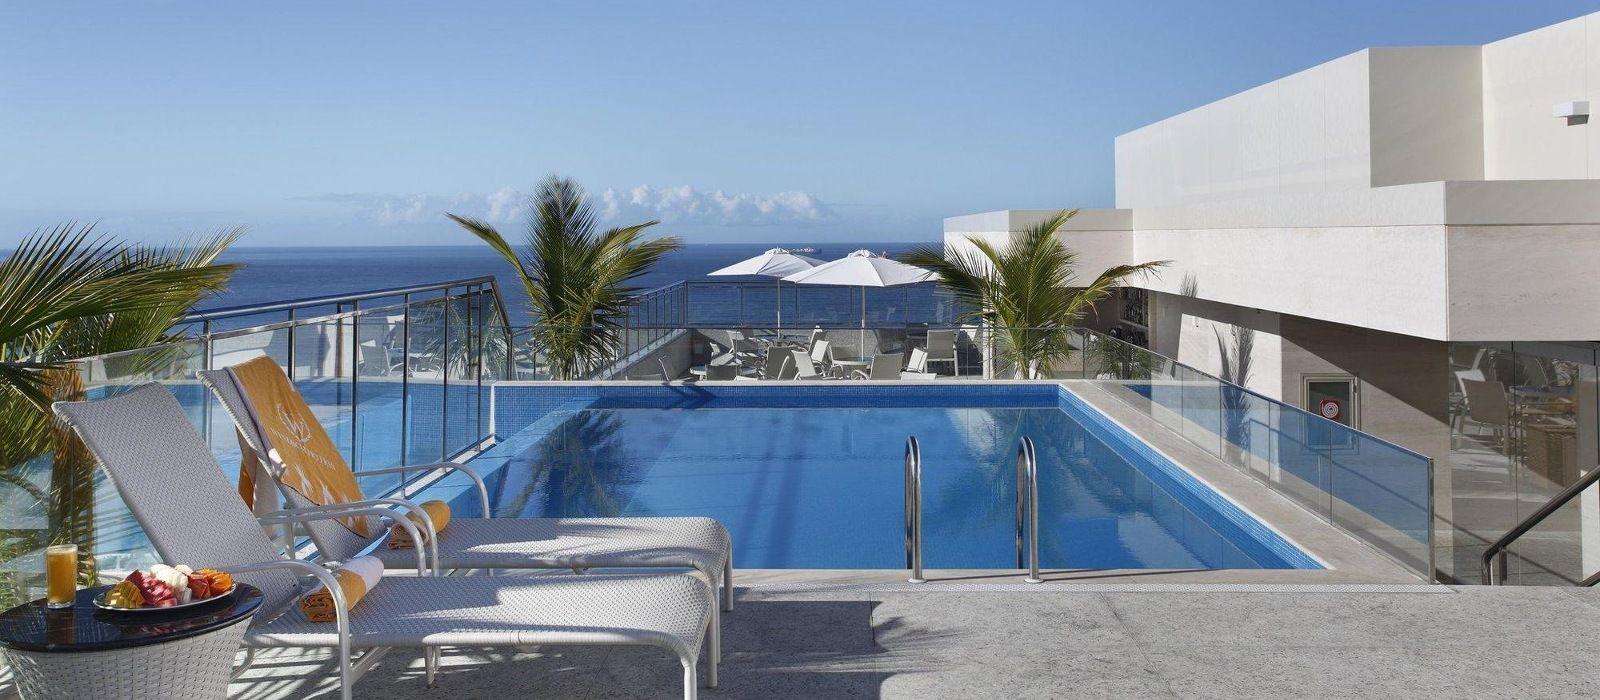 Hotel Hilton Rio de Janeiro Copacabana Brazil